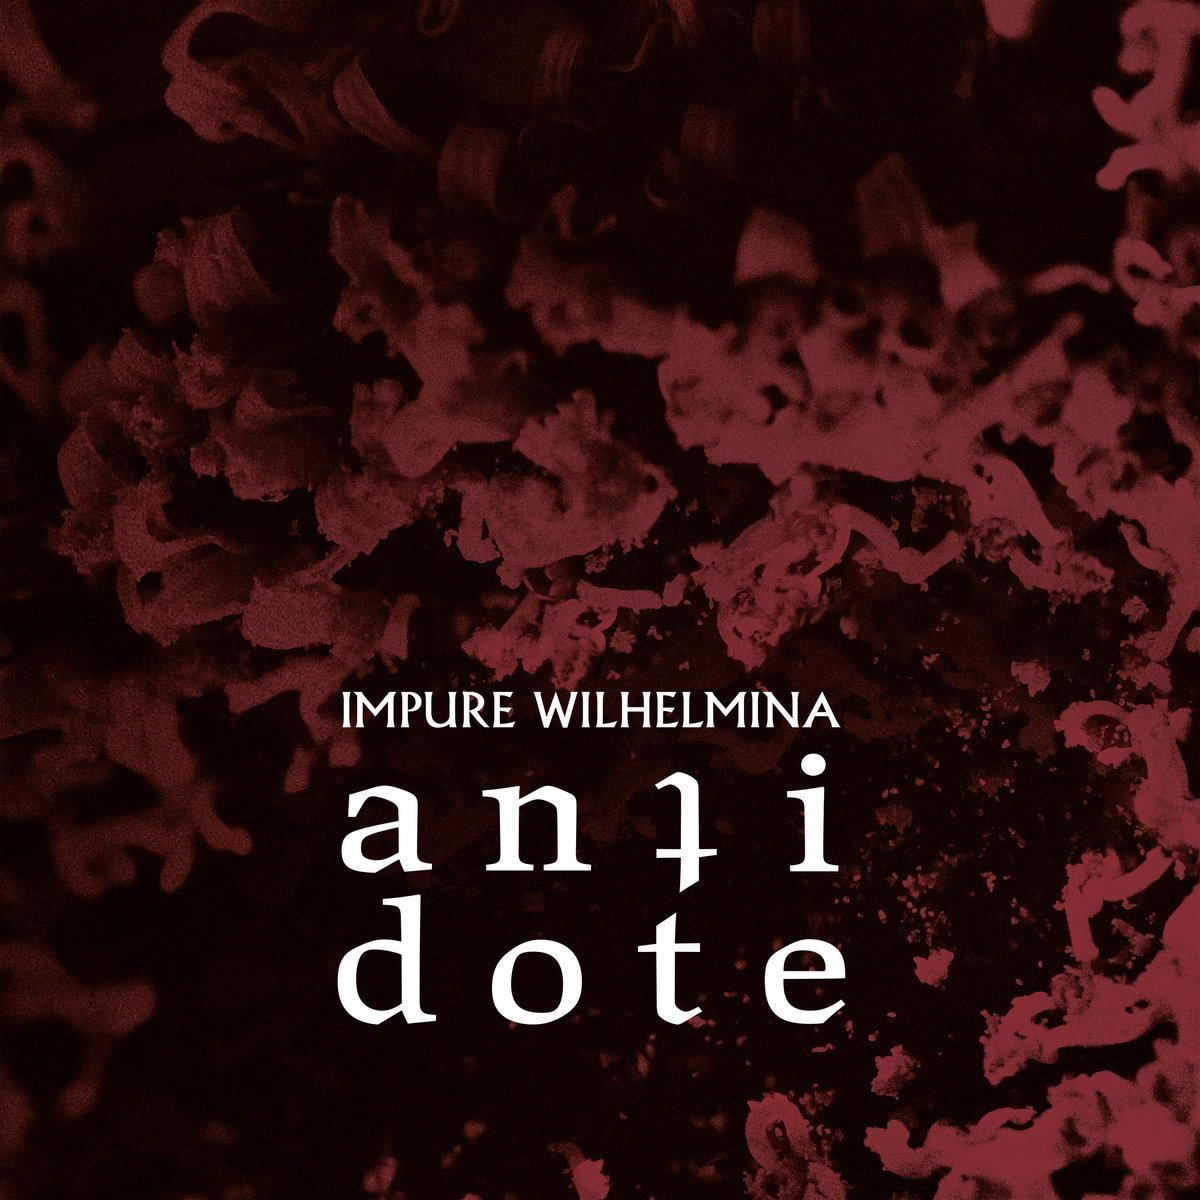 Impure Wilhelmina: Antidote